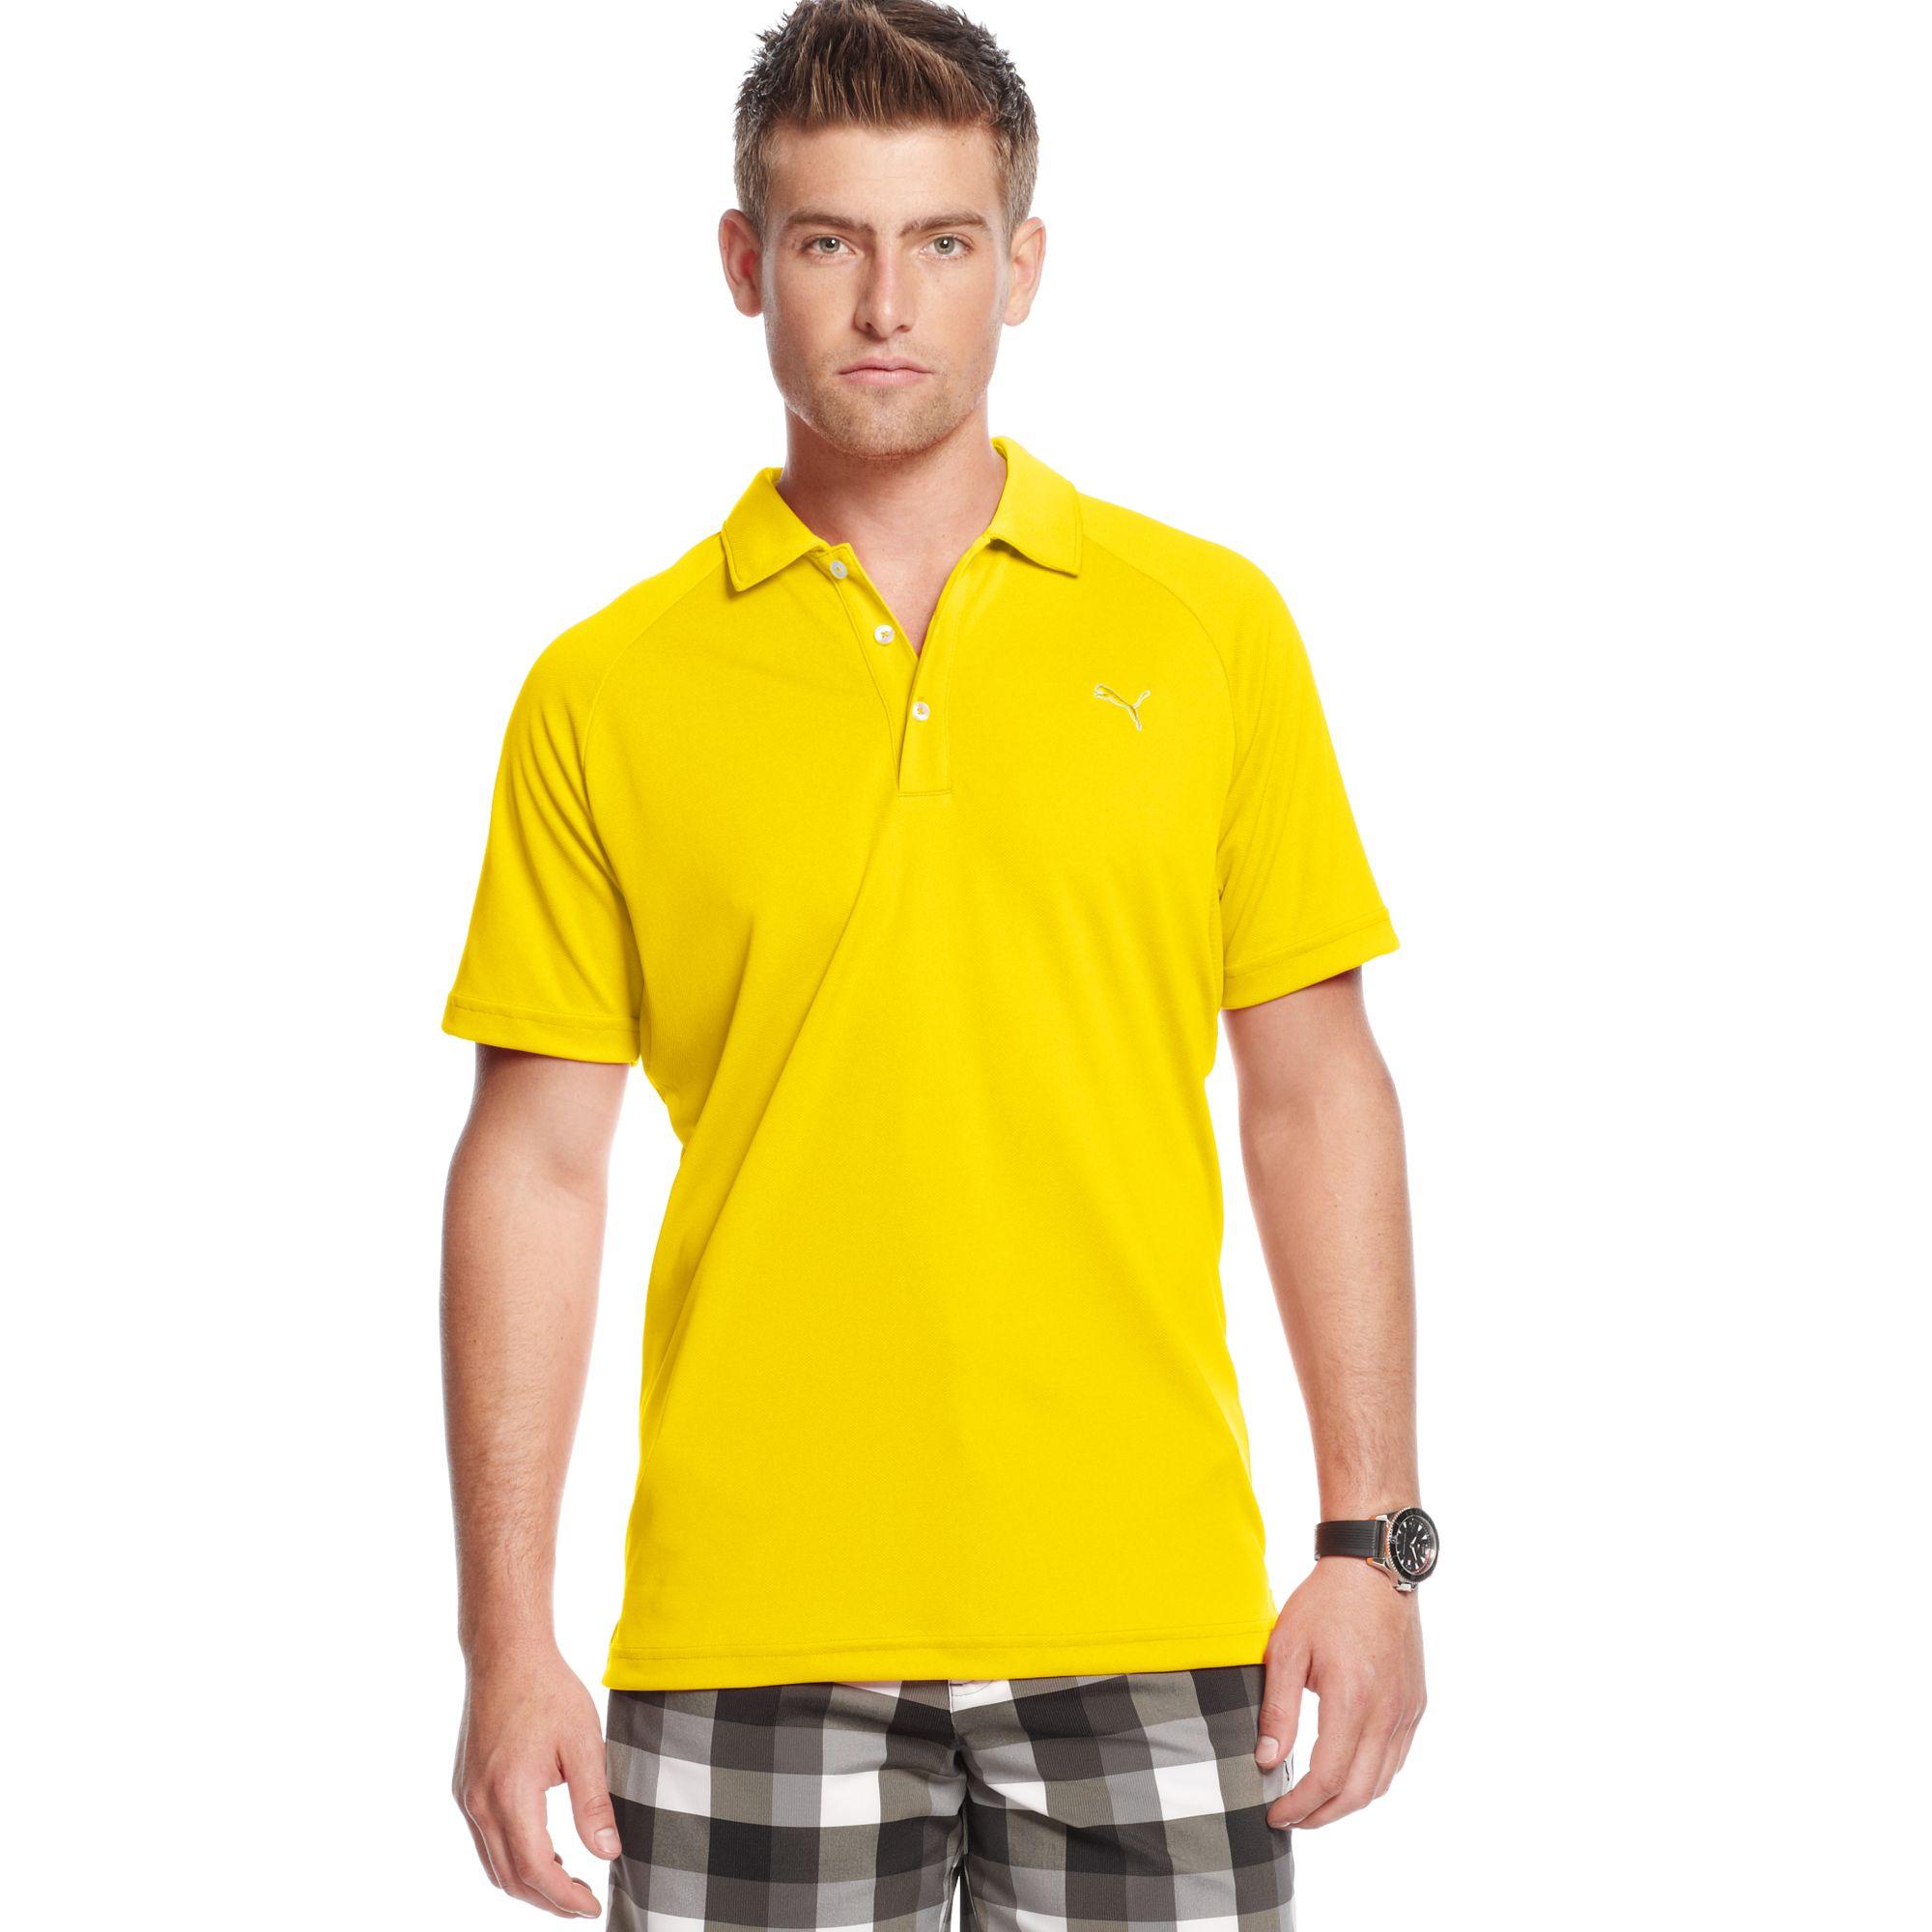 Puma raglan tech performance golf polo shirt in yellow for for Yellow golf polo shirts